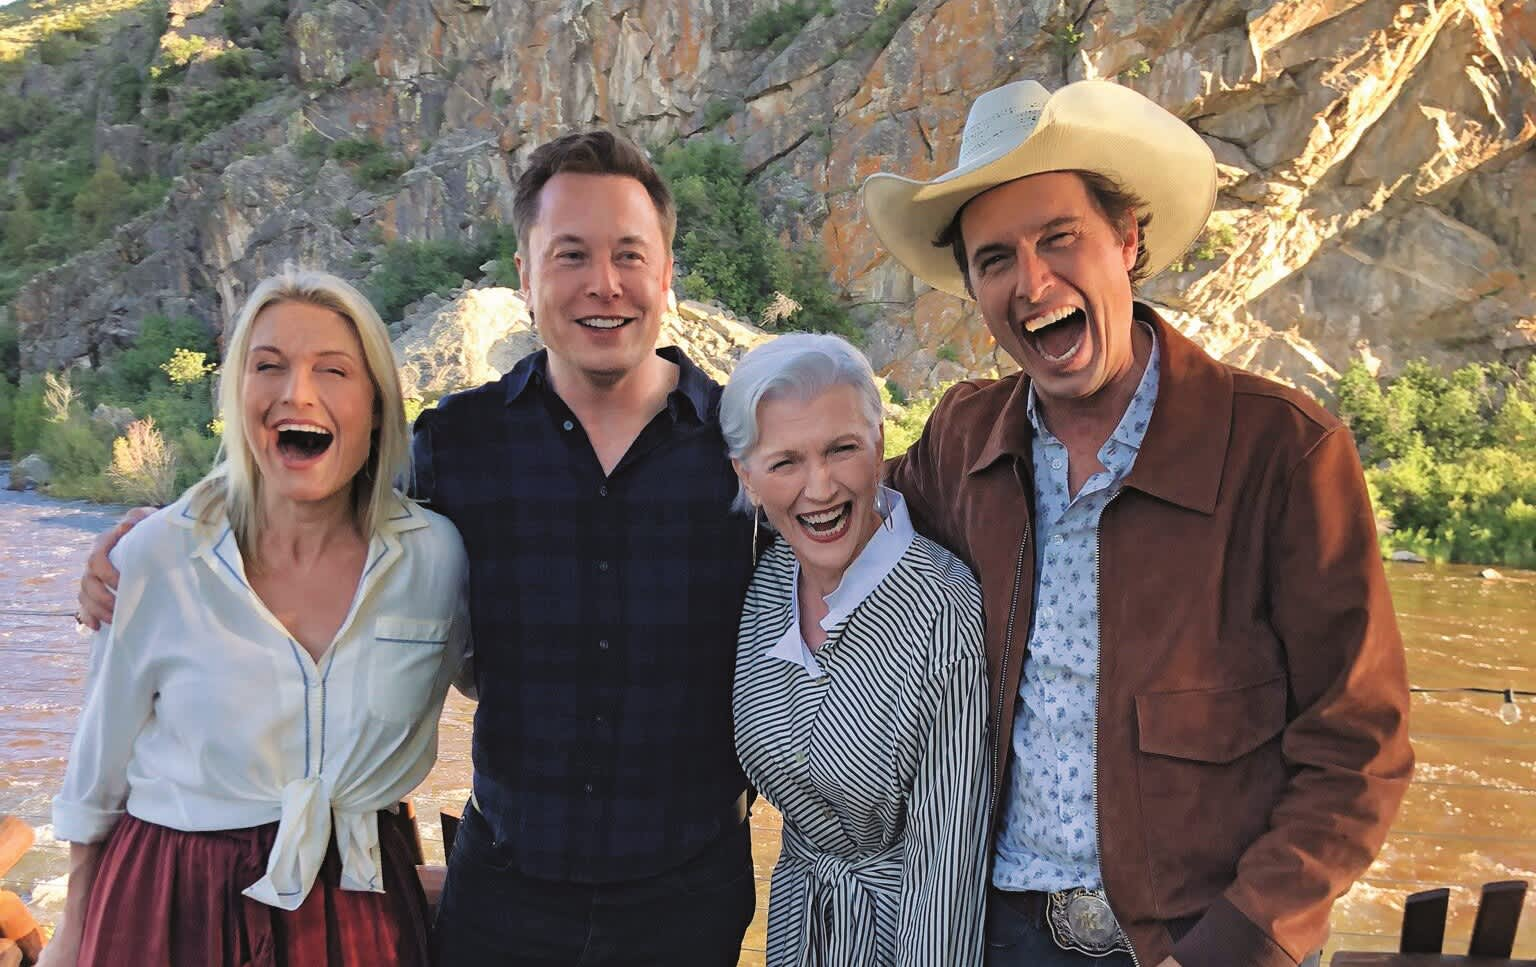 Elon Musk's mom on raising successful kids: 'I didn't treat them like babies or scold them'